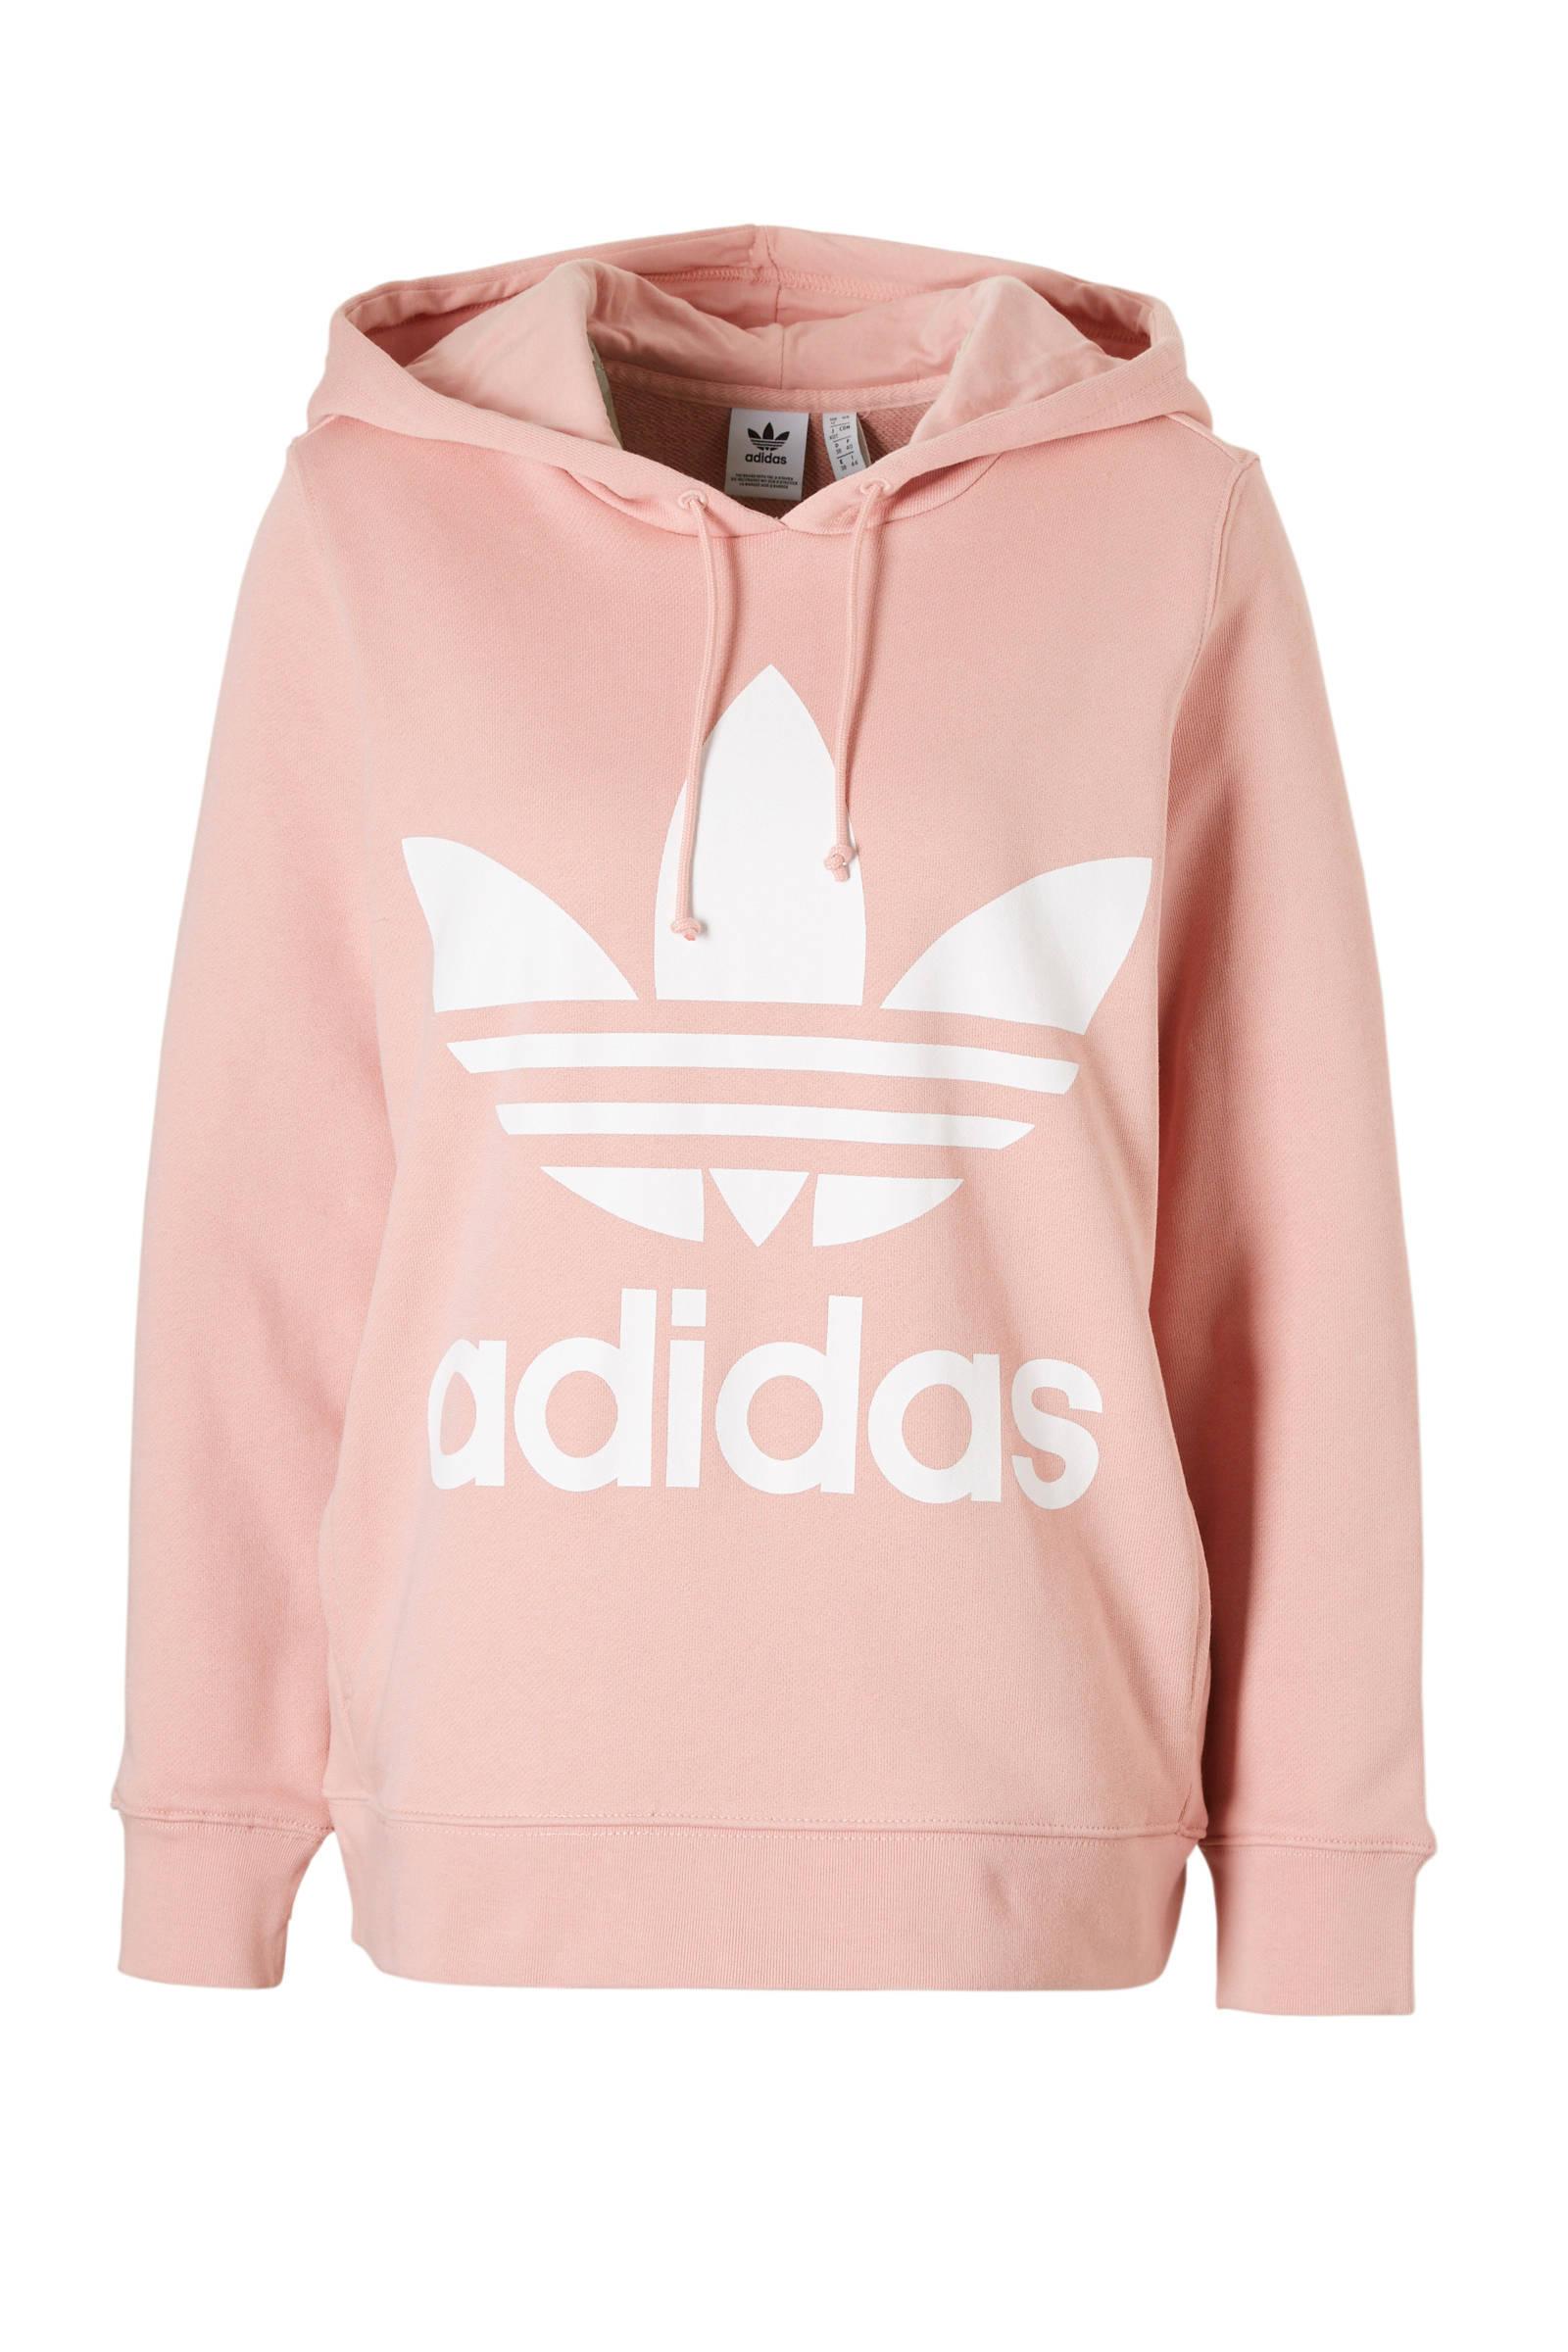 Adidas Oudroze Originals Originals Hoodie Adidas Hoodie Originals Wehkamp Oudroze Wehkamp Adidas OOaxzqr